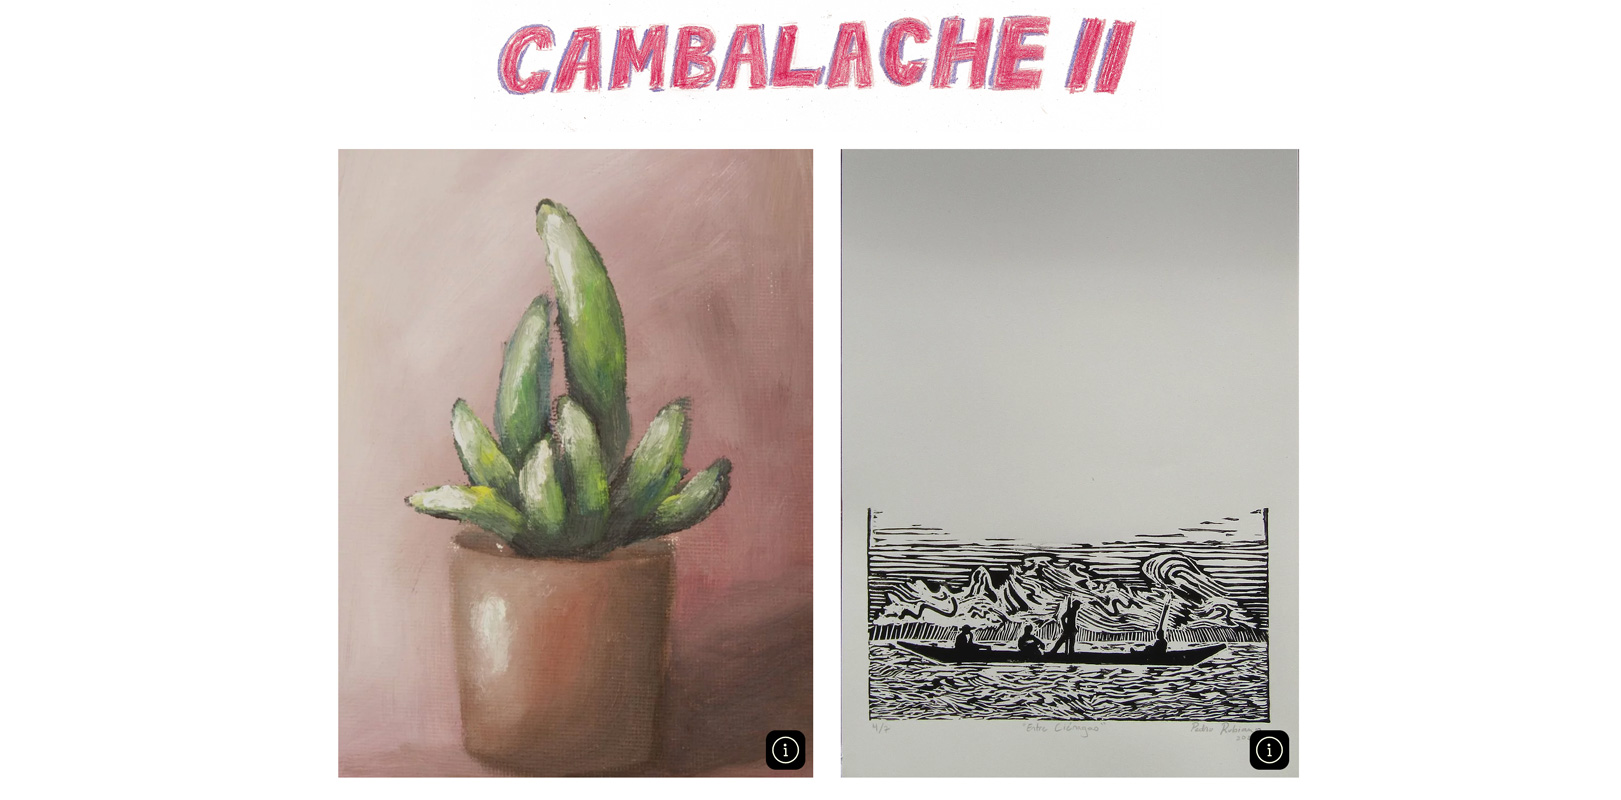 Cambalache II: Subasta apoyo Fiprovidence